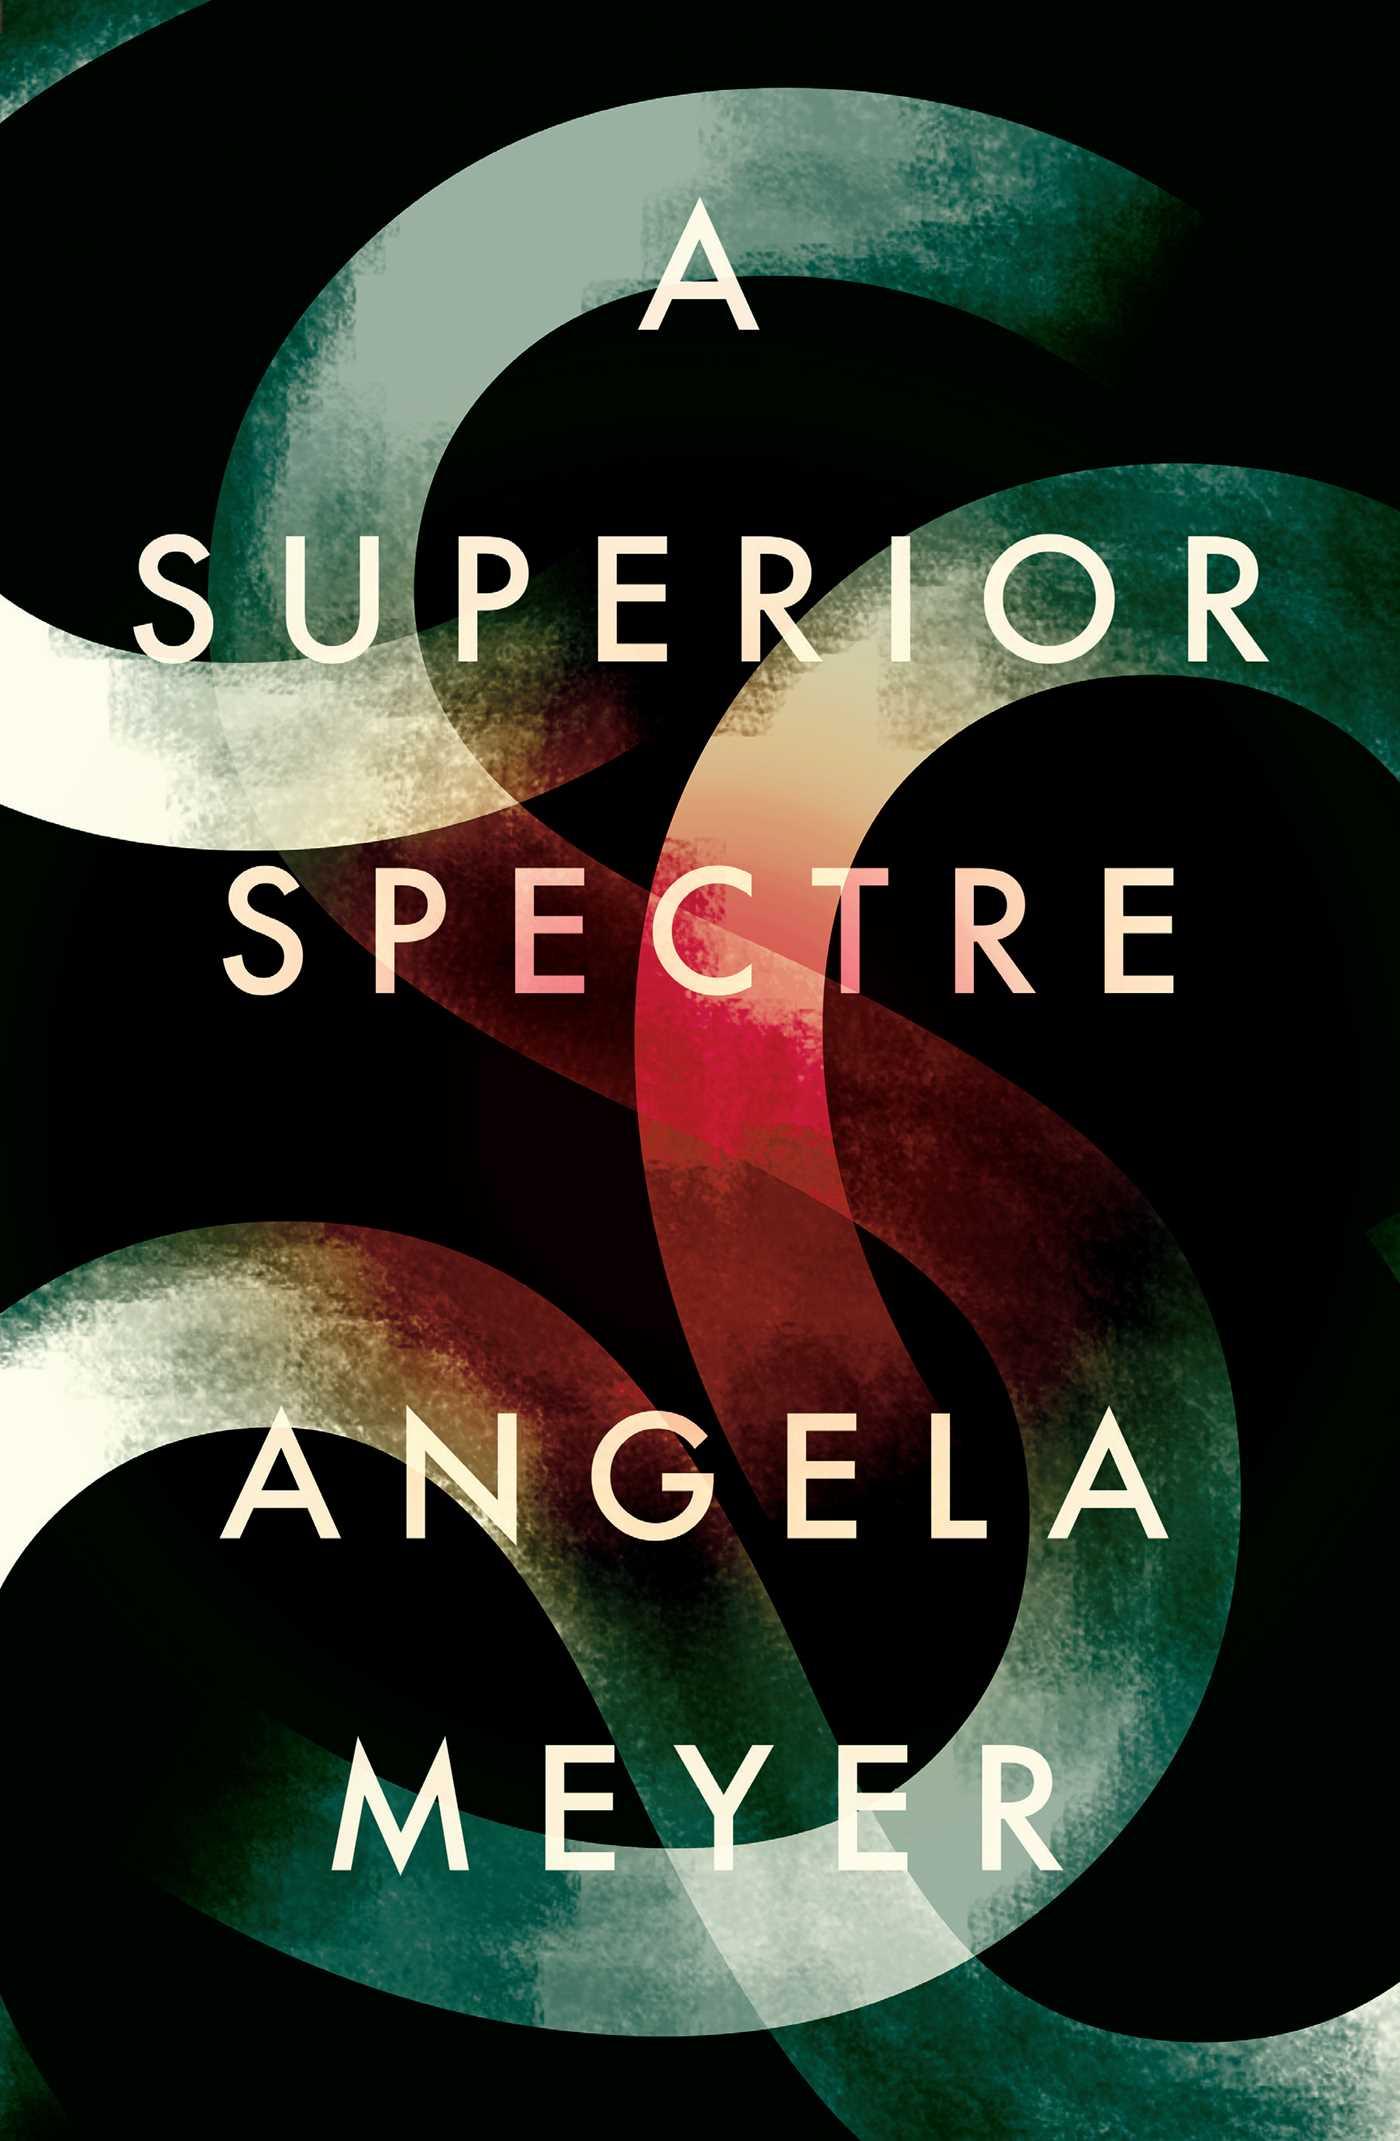 A superior spectre 9781925183917 hr